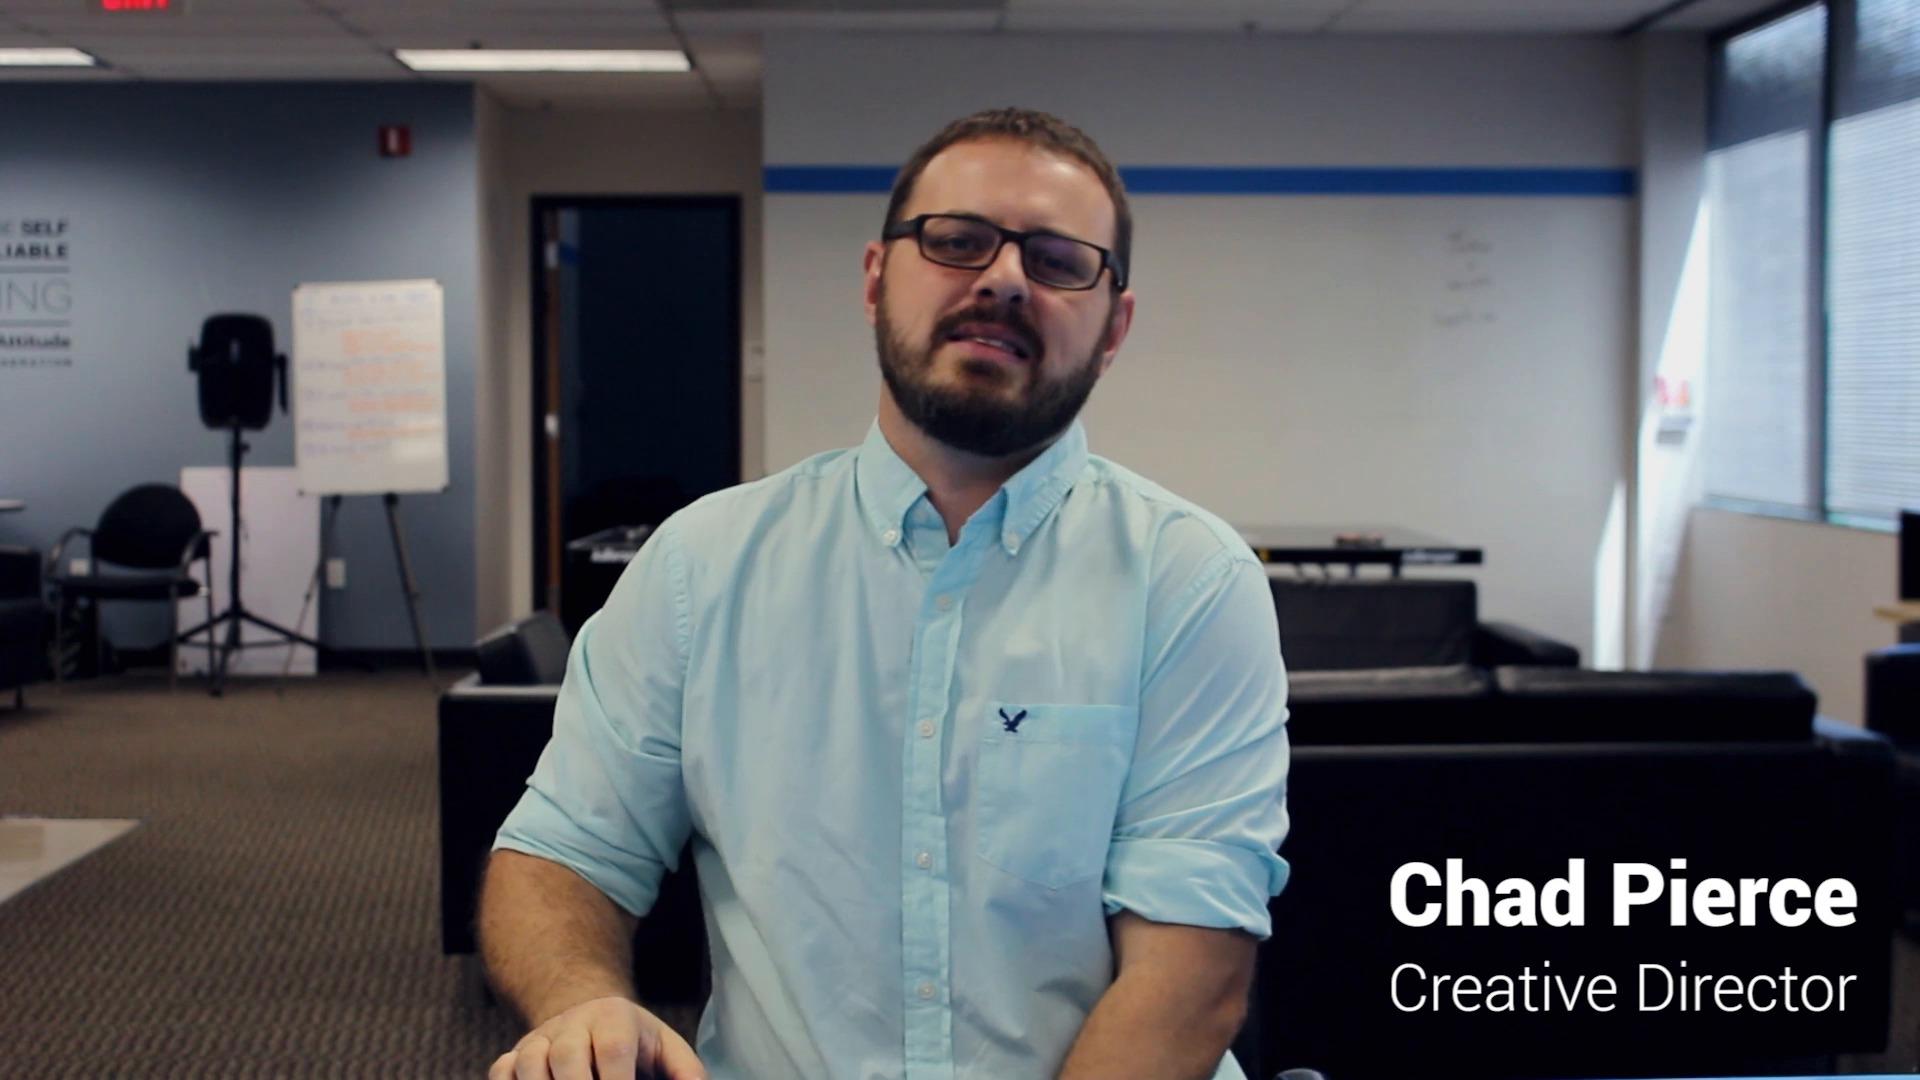 sc 1 st  Bluleadz & Video DIY: Create a Business Video Studio for Less Than $1000